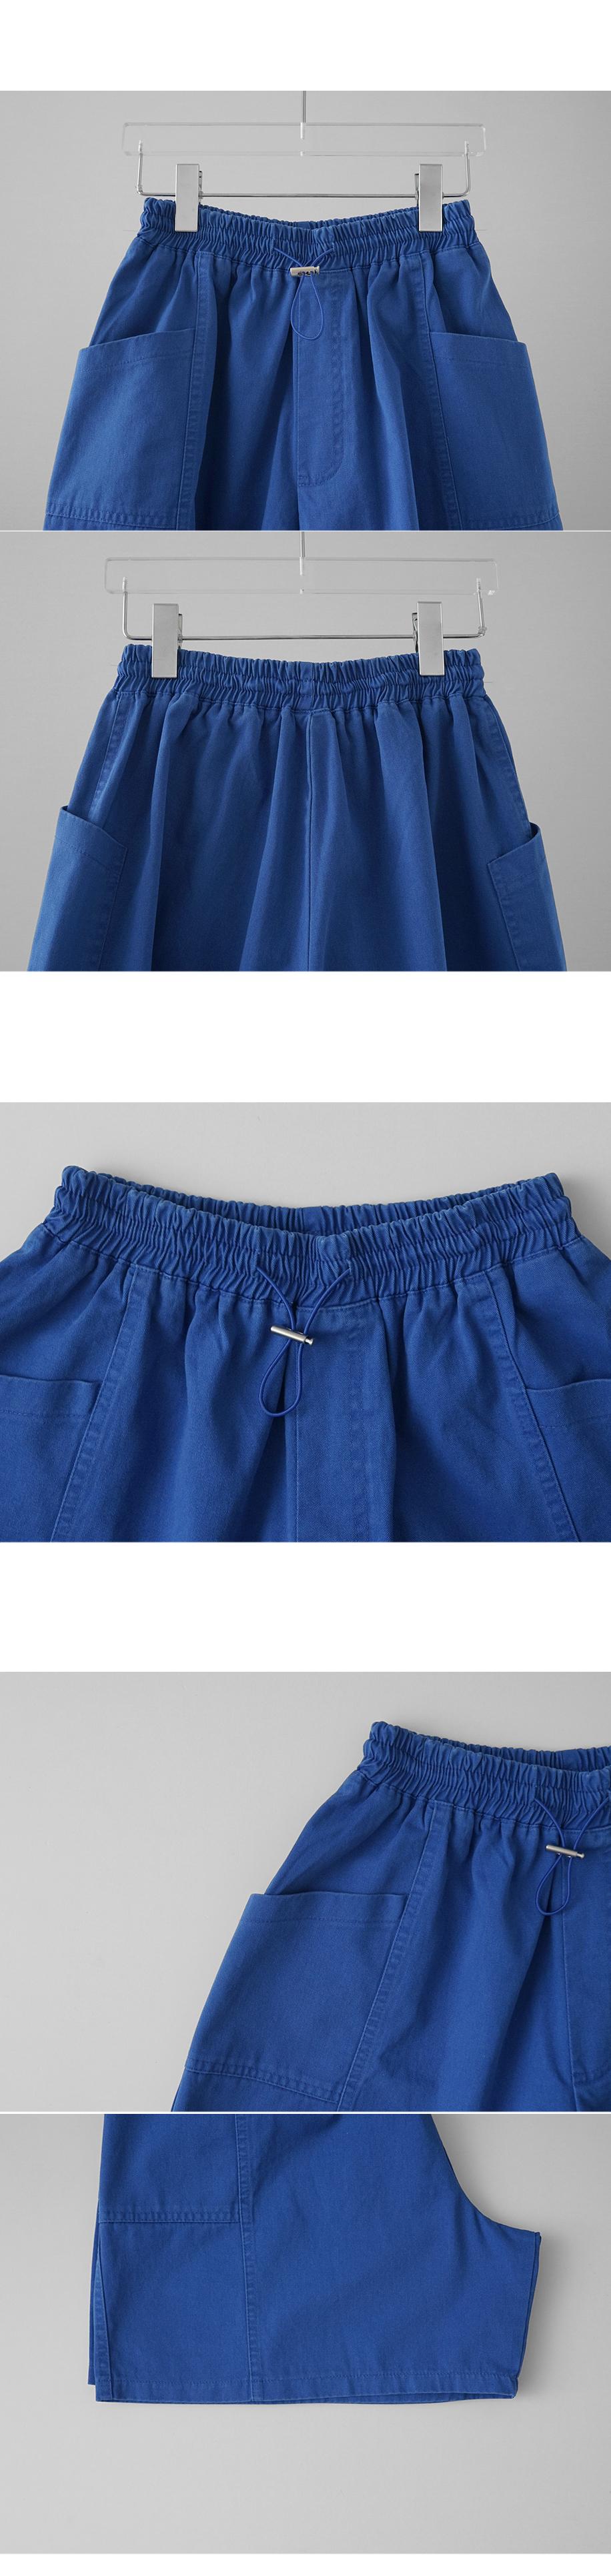 washing cotton shorts